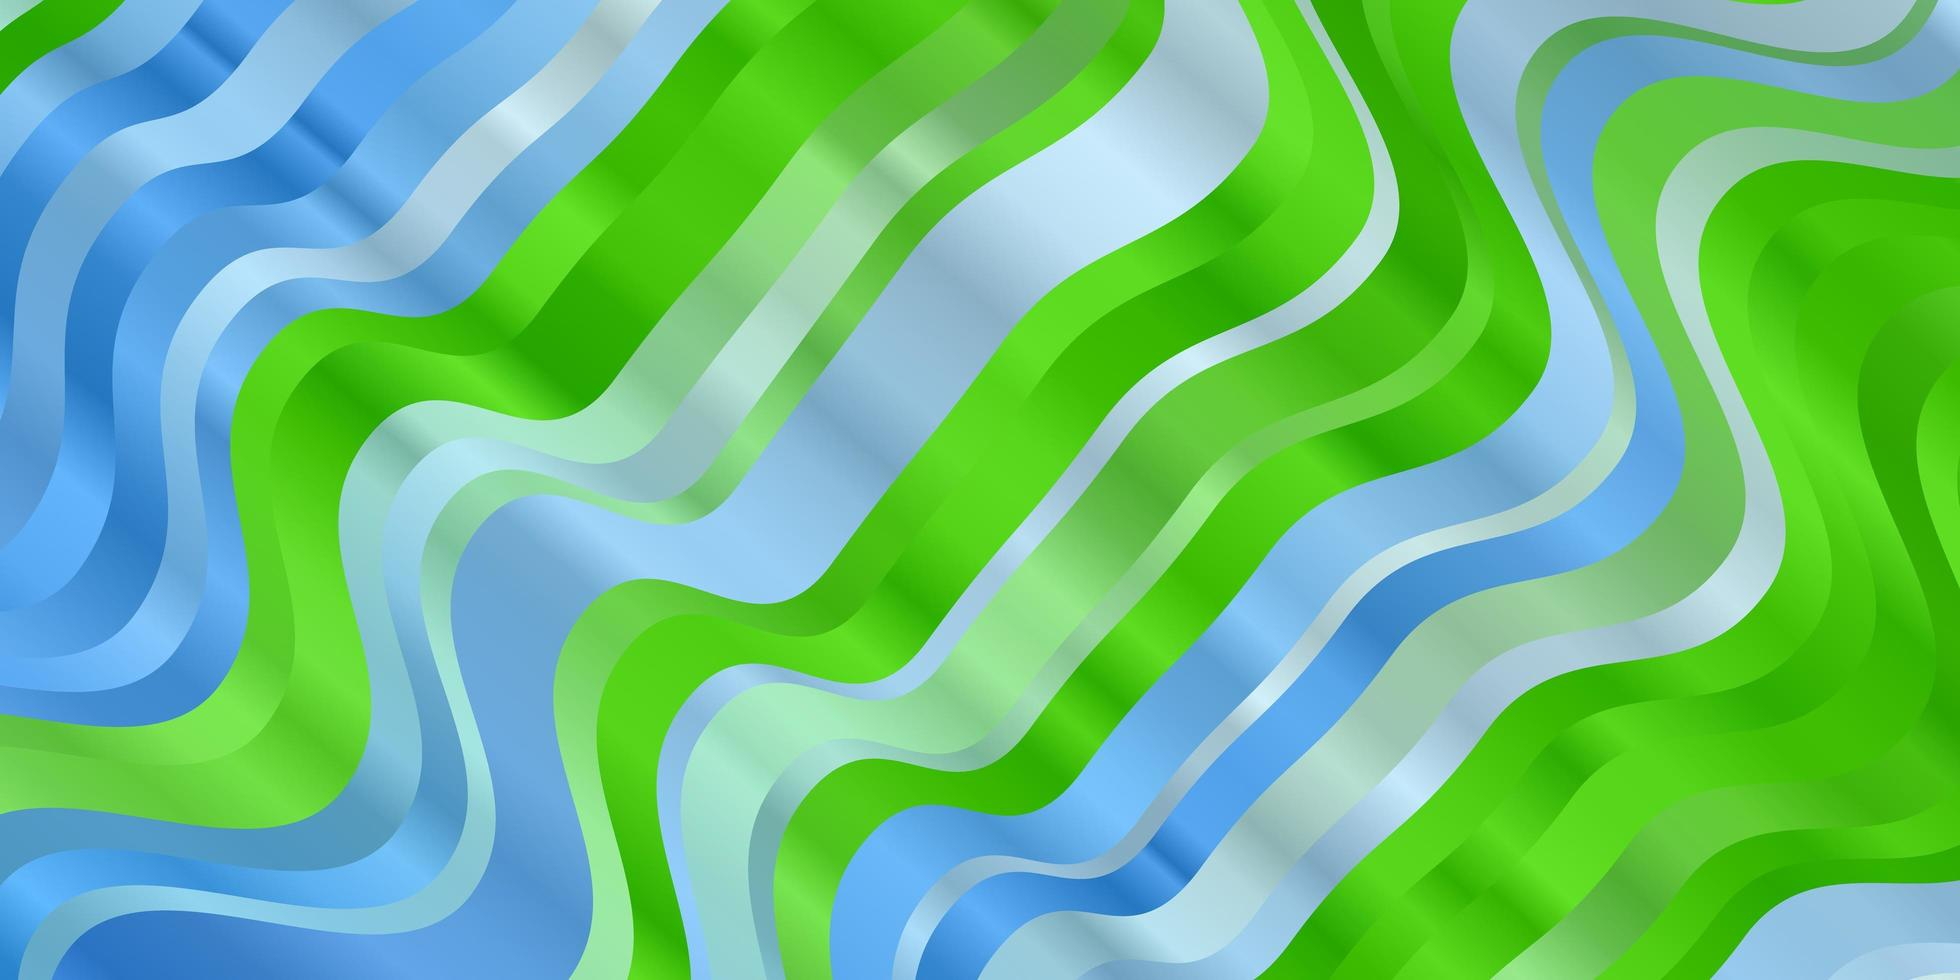 hellblaues, grünes Vektormuster mit schiefen Linien. vektor